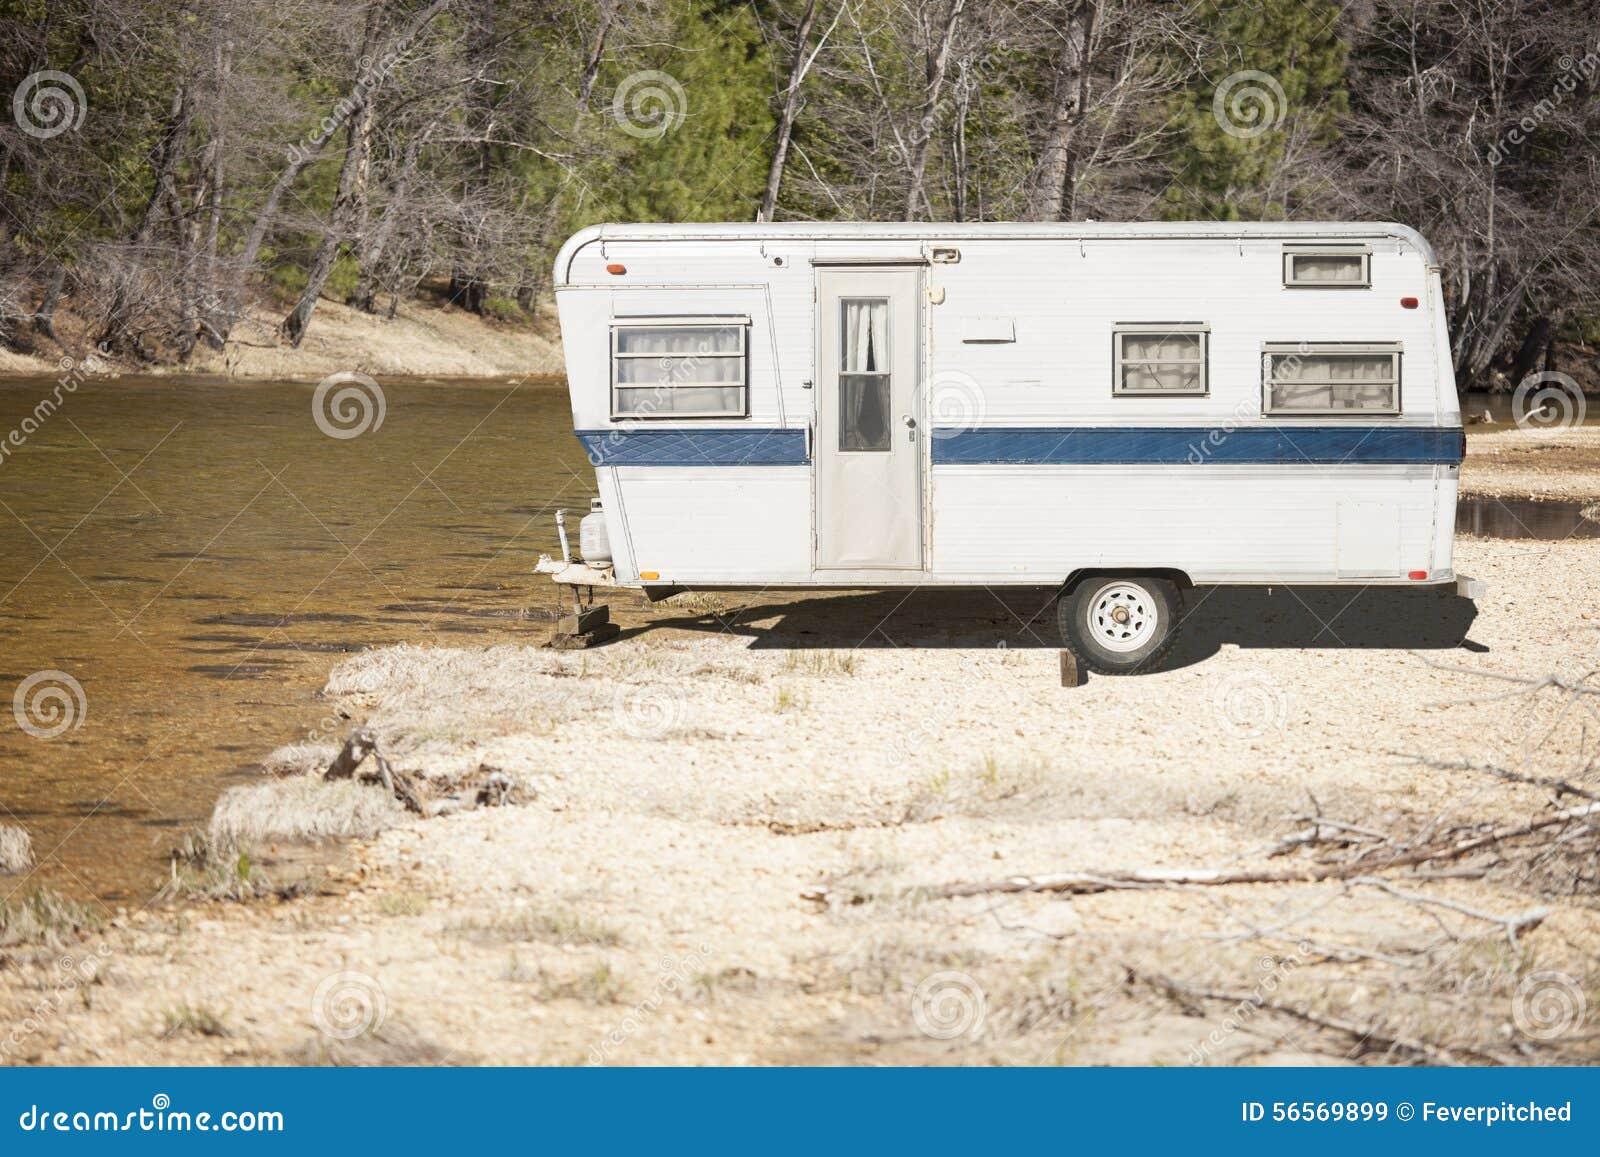 Download Παλαιό κλασικό ρυμουλκό τροχόσπιτων κοντά σε έναν ποταμό Στοκ Εικόνα - εικόνα από ταξίδι, μηχανή: 56569899